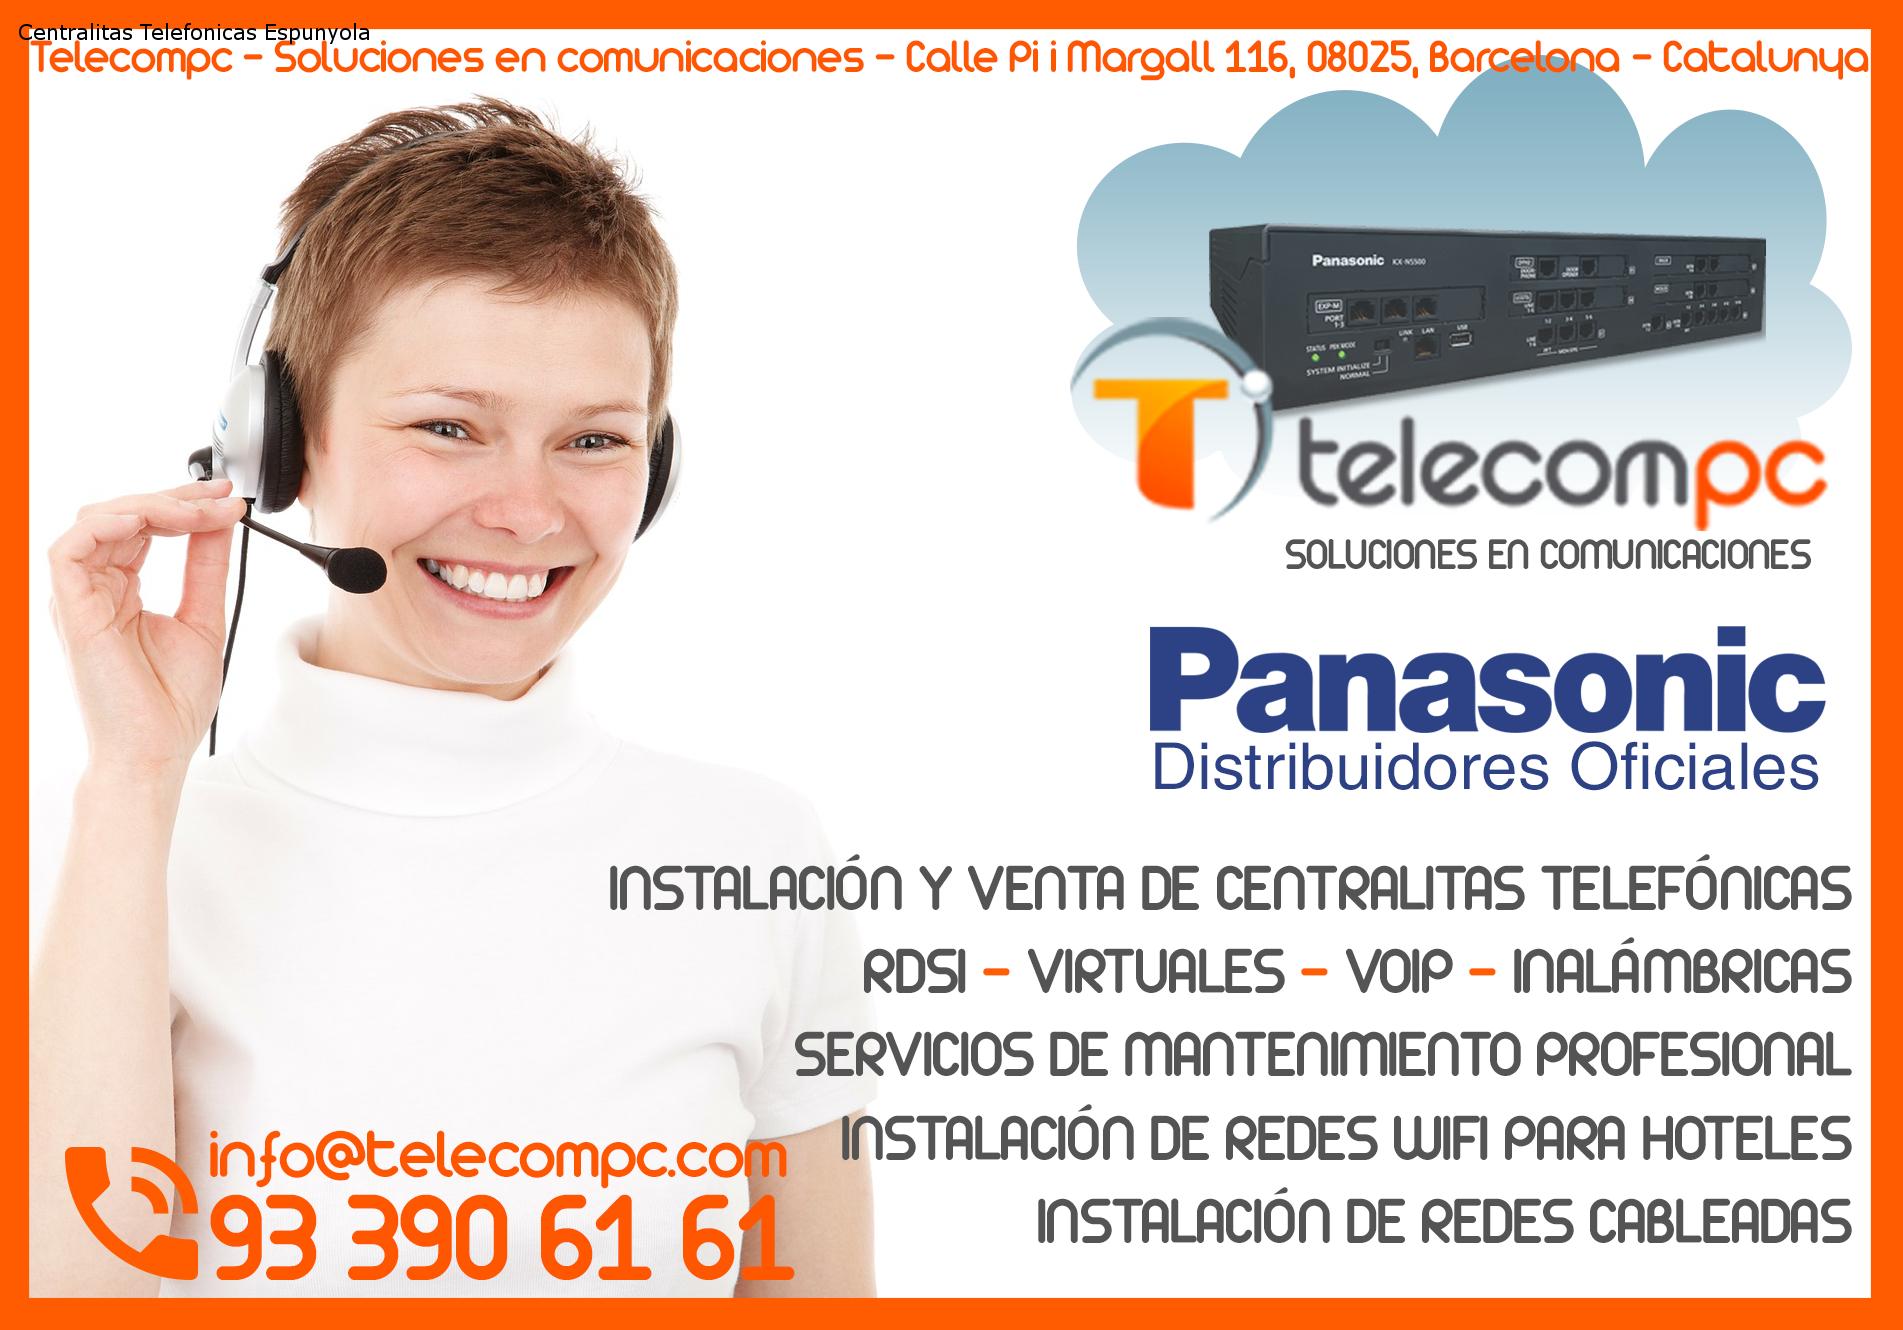 Centralitas Telefonicas Espunyola